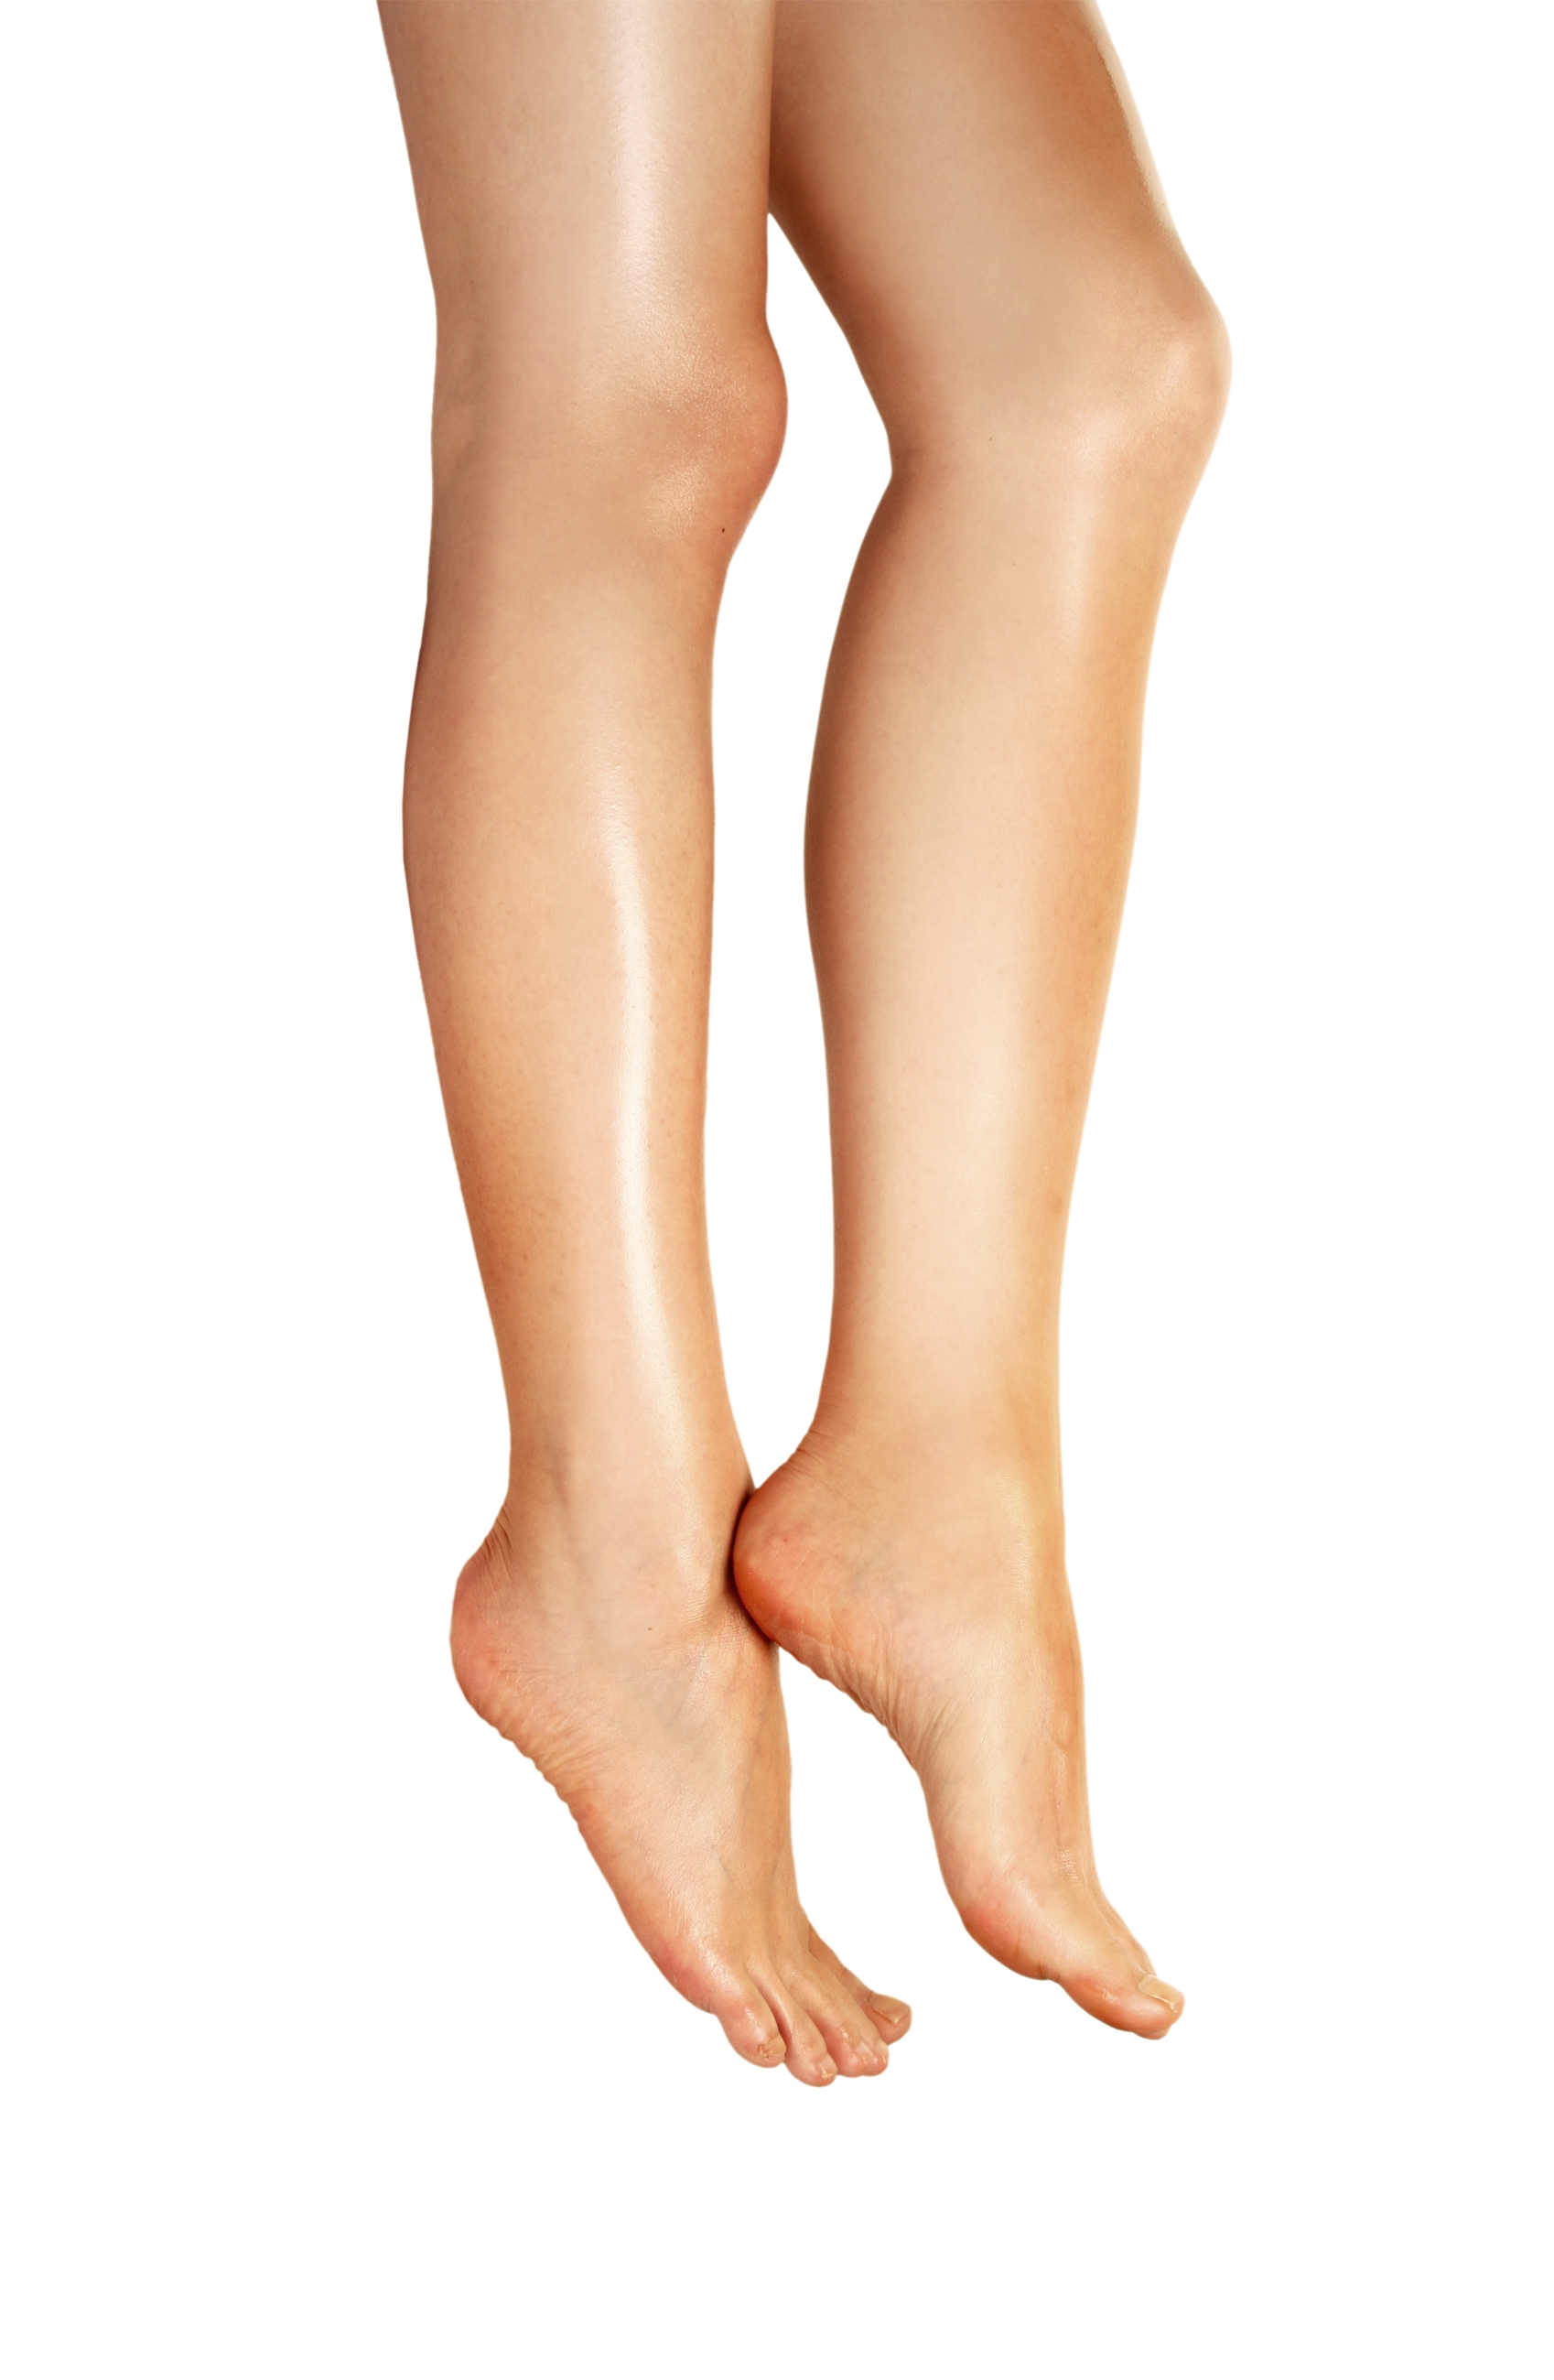 1698x2600 Vibrant Inspiration Leg Clipart Clip Art Parts Of The Body B W